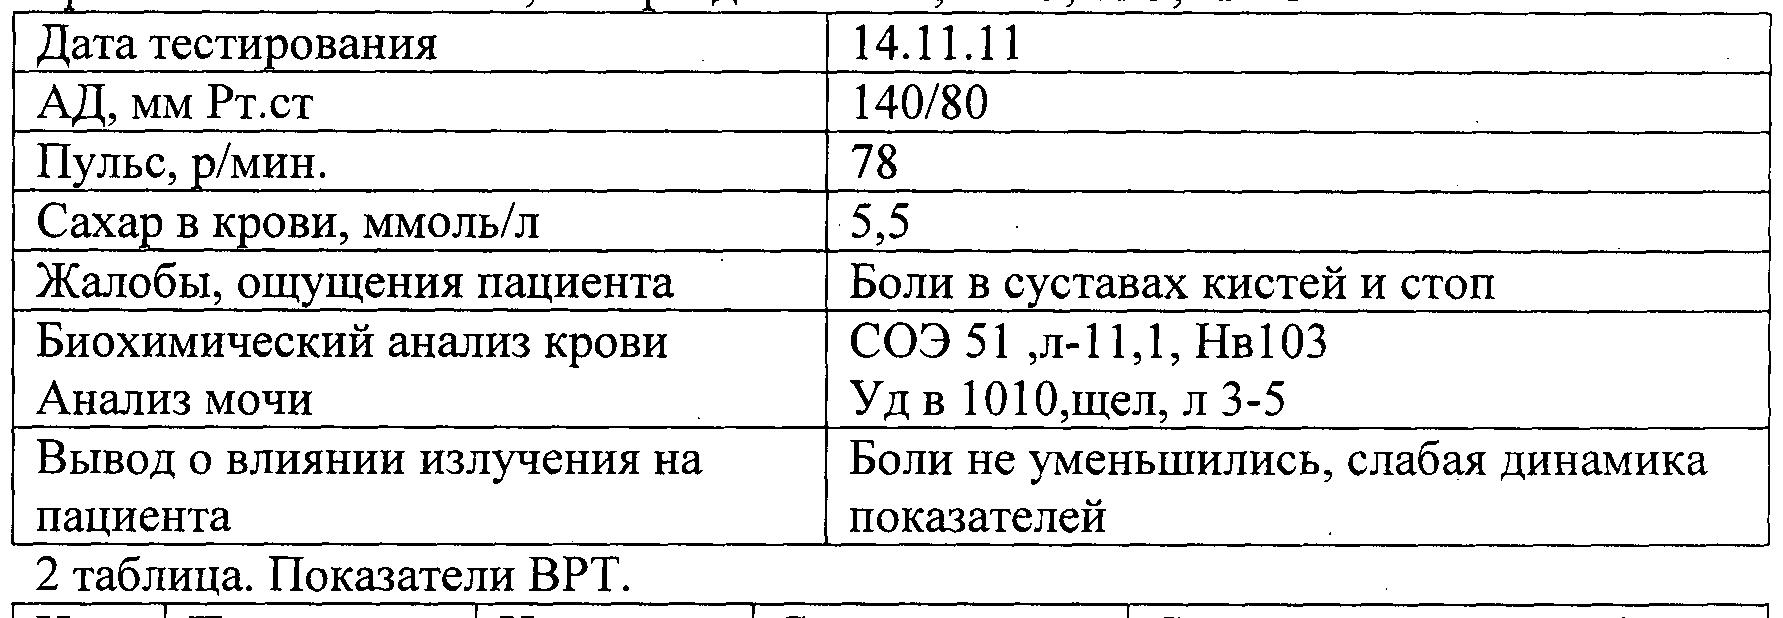 Код анализа крови 0003 рфмк анализ крови норма при беременности